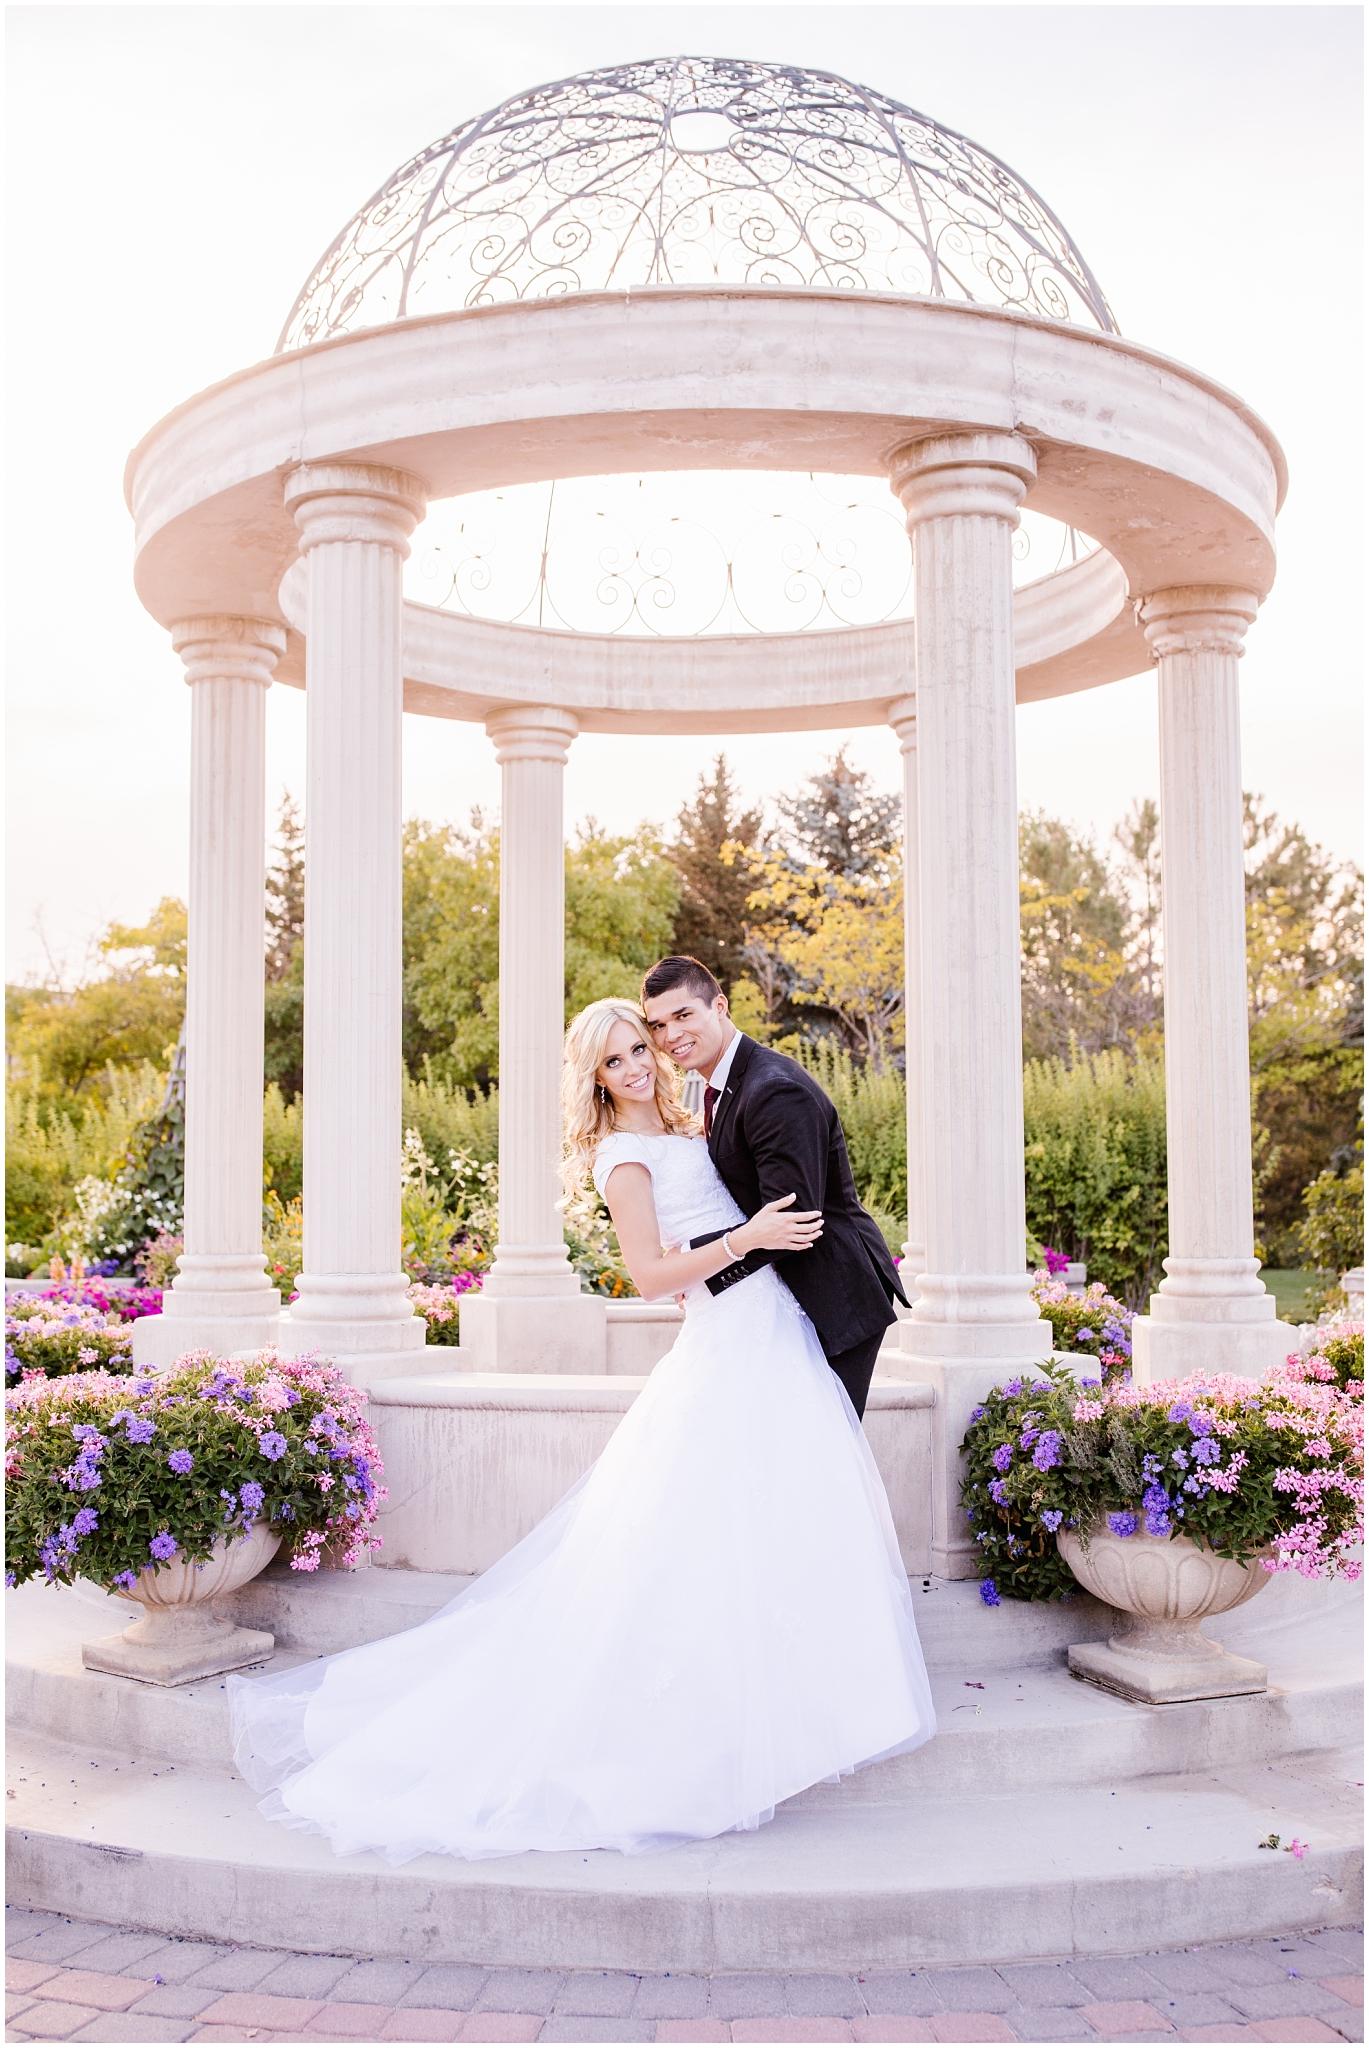 CHBridals-34_Lizzie-B-Imagery-Utah-Wedding-Photographer-Salt-Lake-City-Park-City-Thanksgiving-Point-Ashton-Gardens.jpg